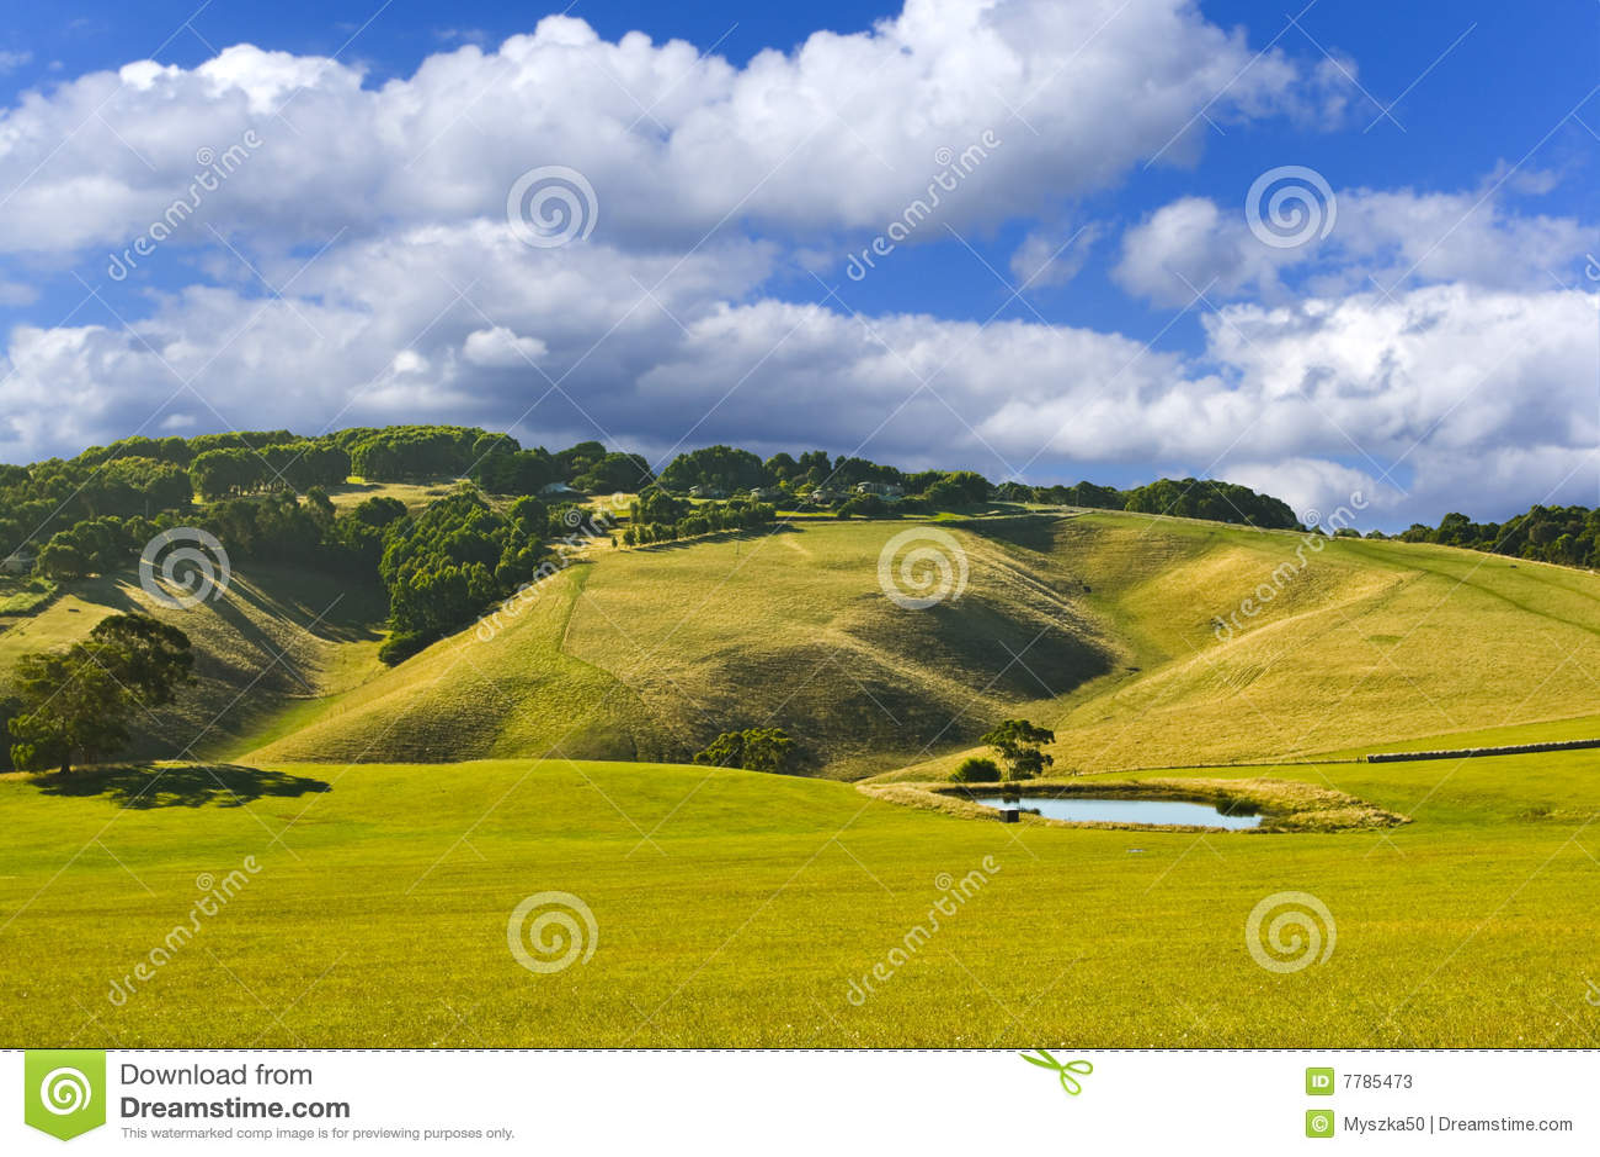 Beautiful country landscape stock image image 7785473 beautiful country landscape sciox Images